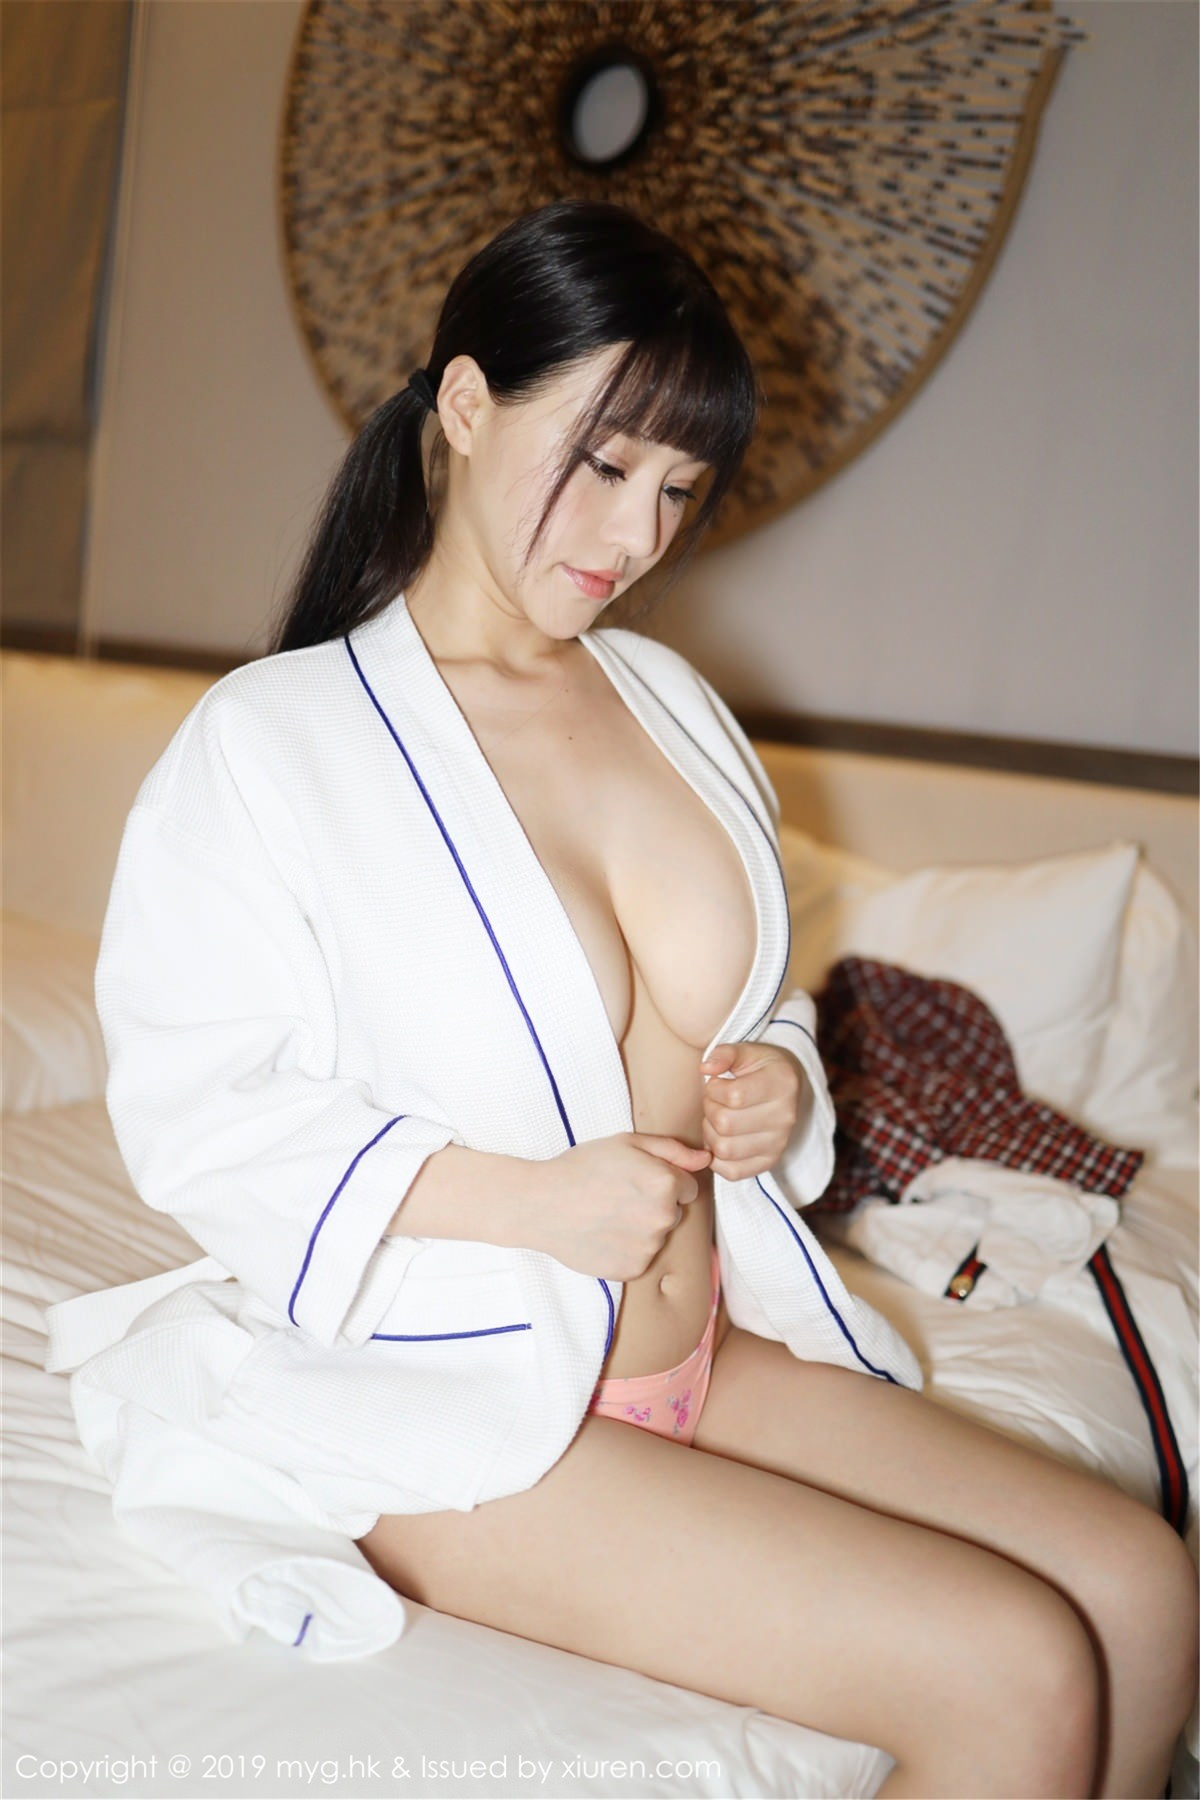 MyGirl Vol.363 51P, mygirl, Zhu Ke Er